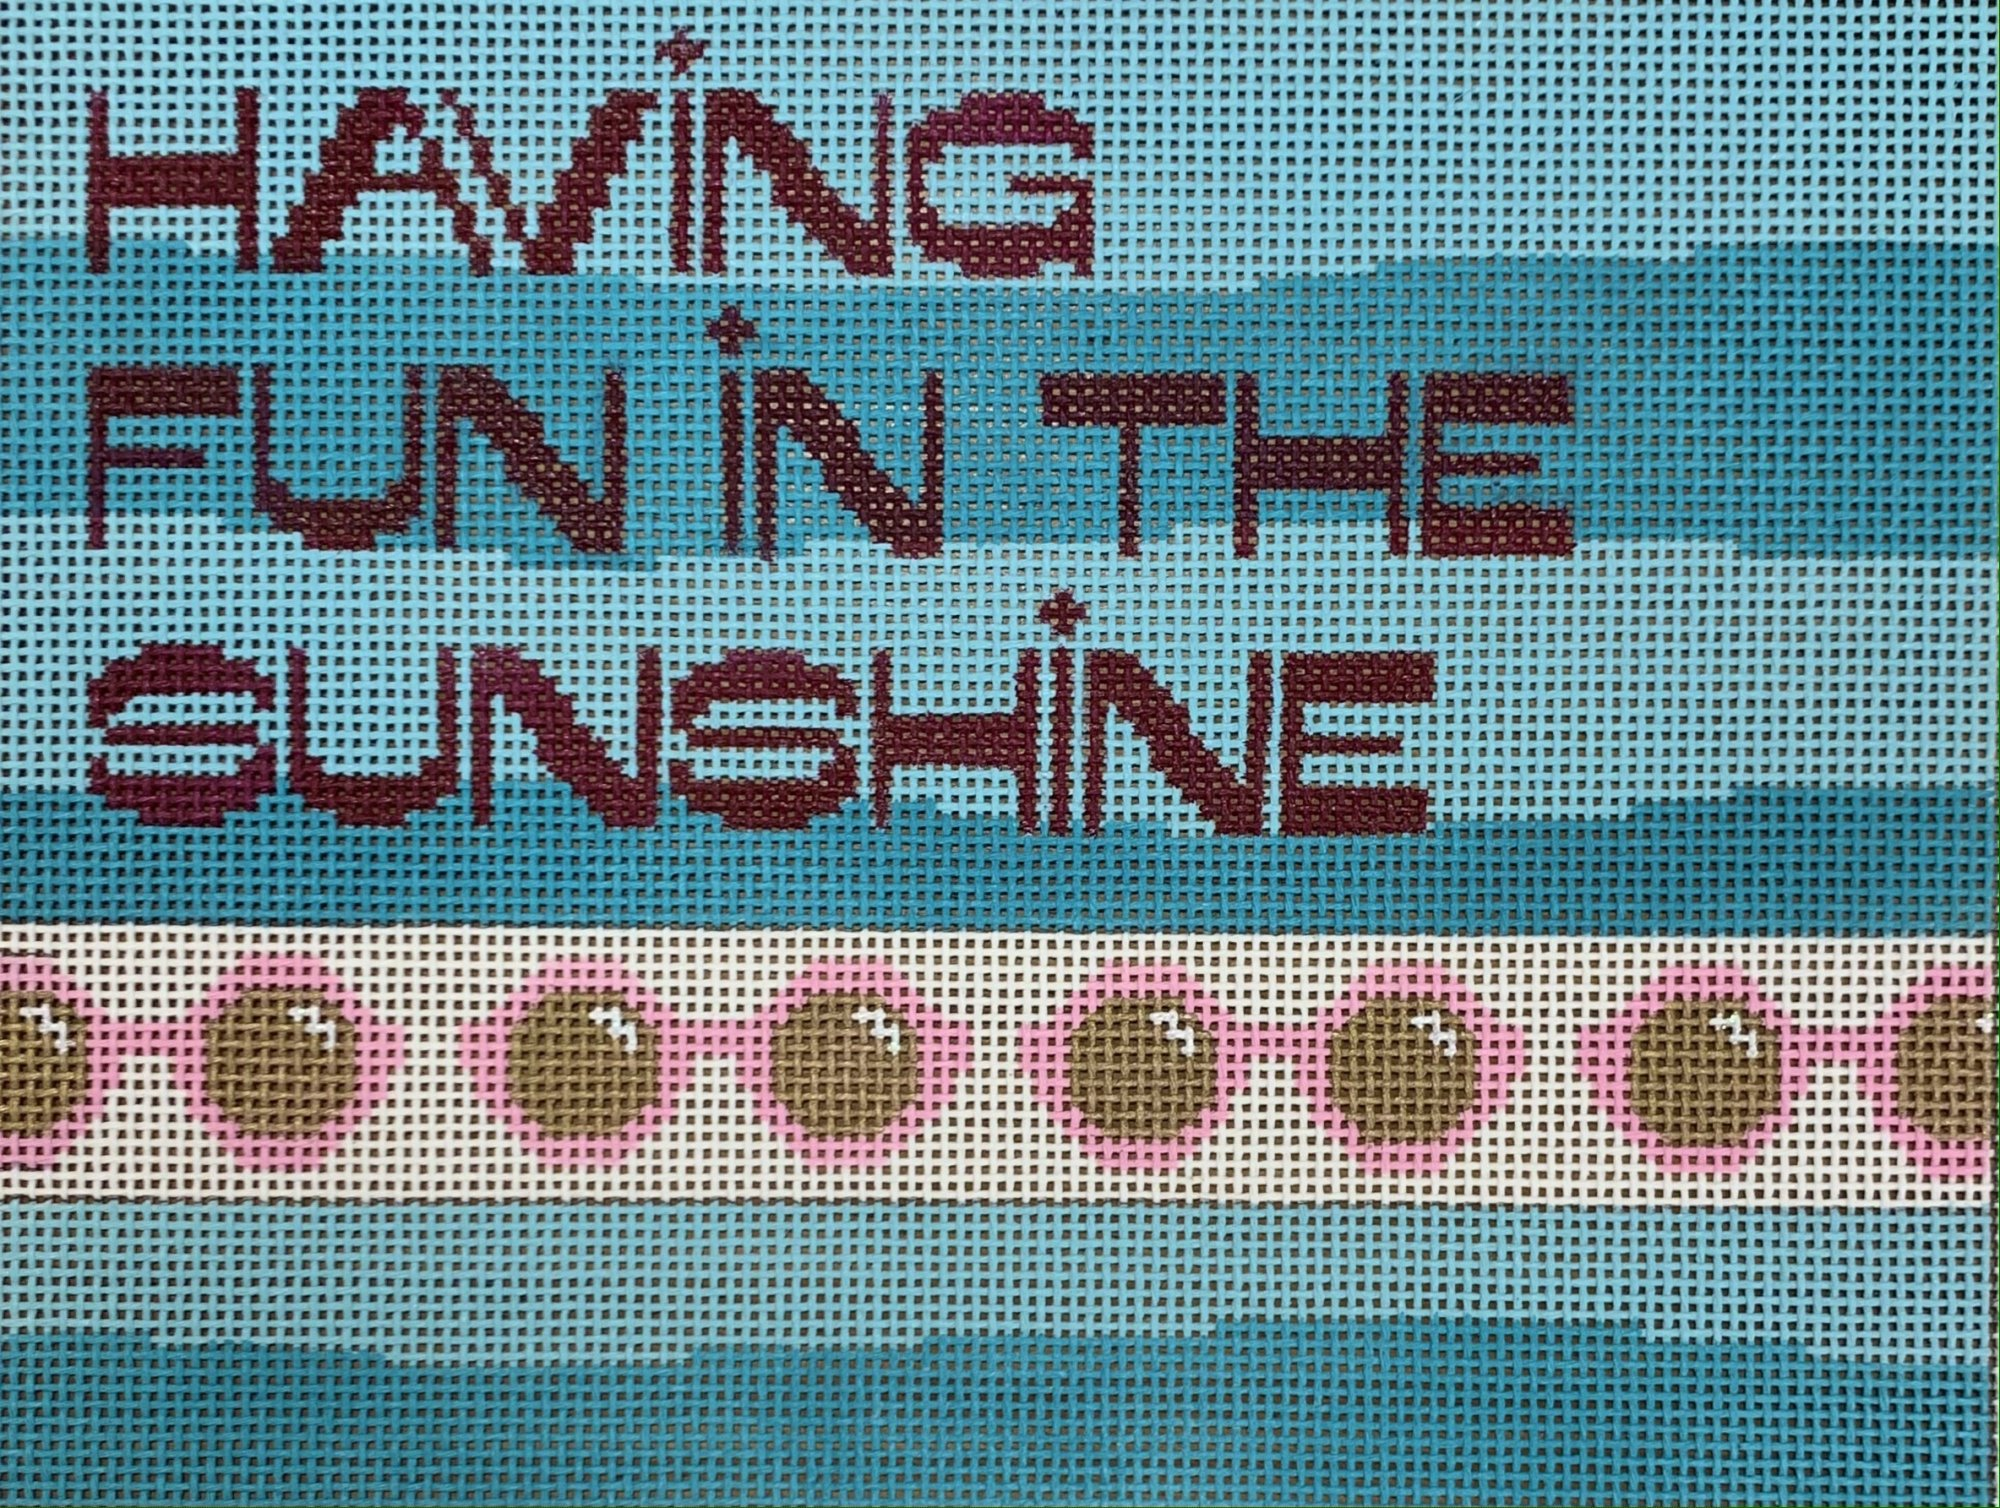 Fun in the Sunshine